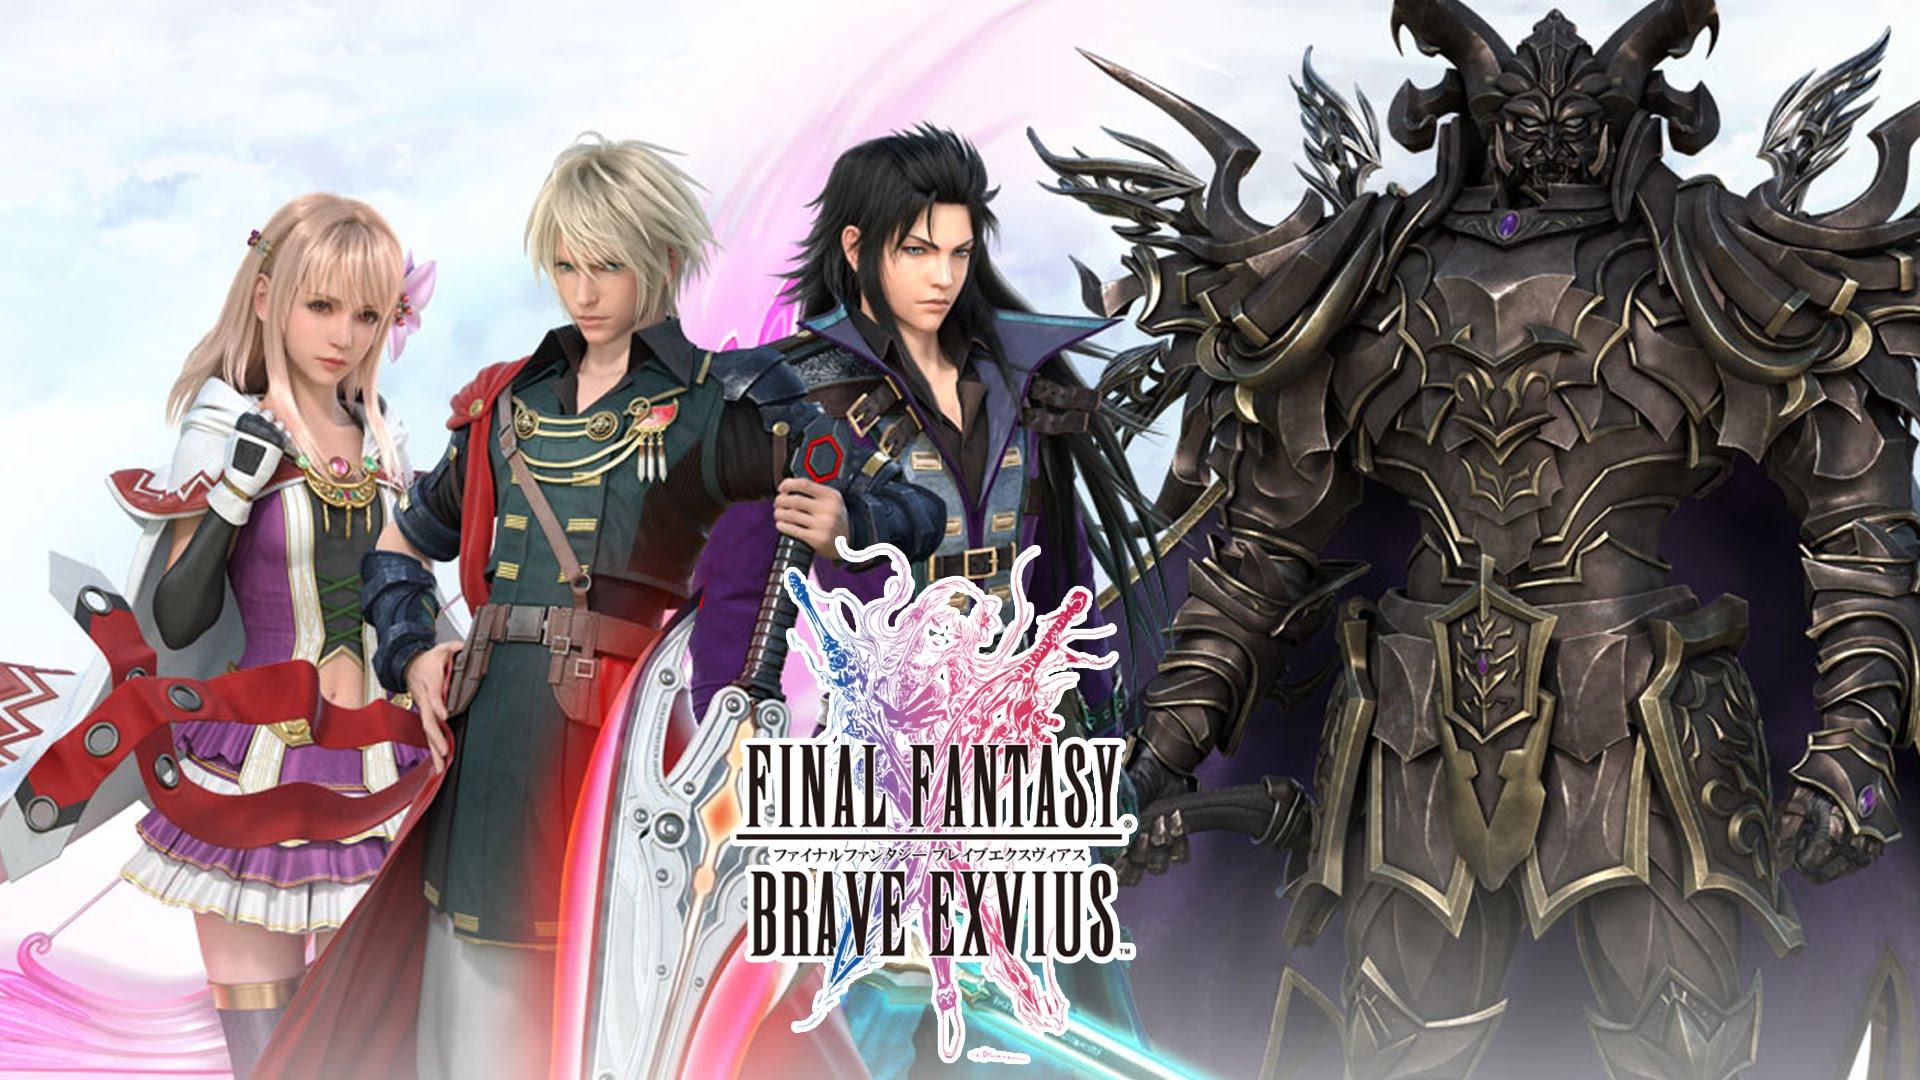 Final Fantasy Brave Exvius Best Android Game